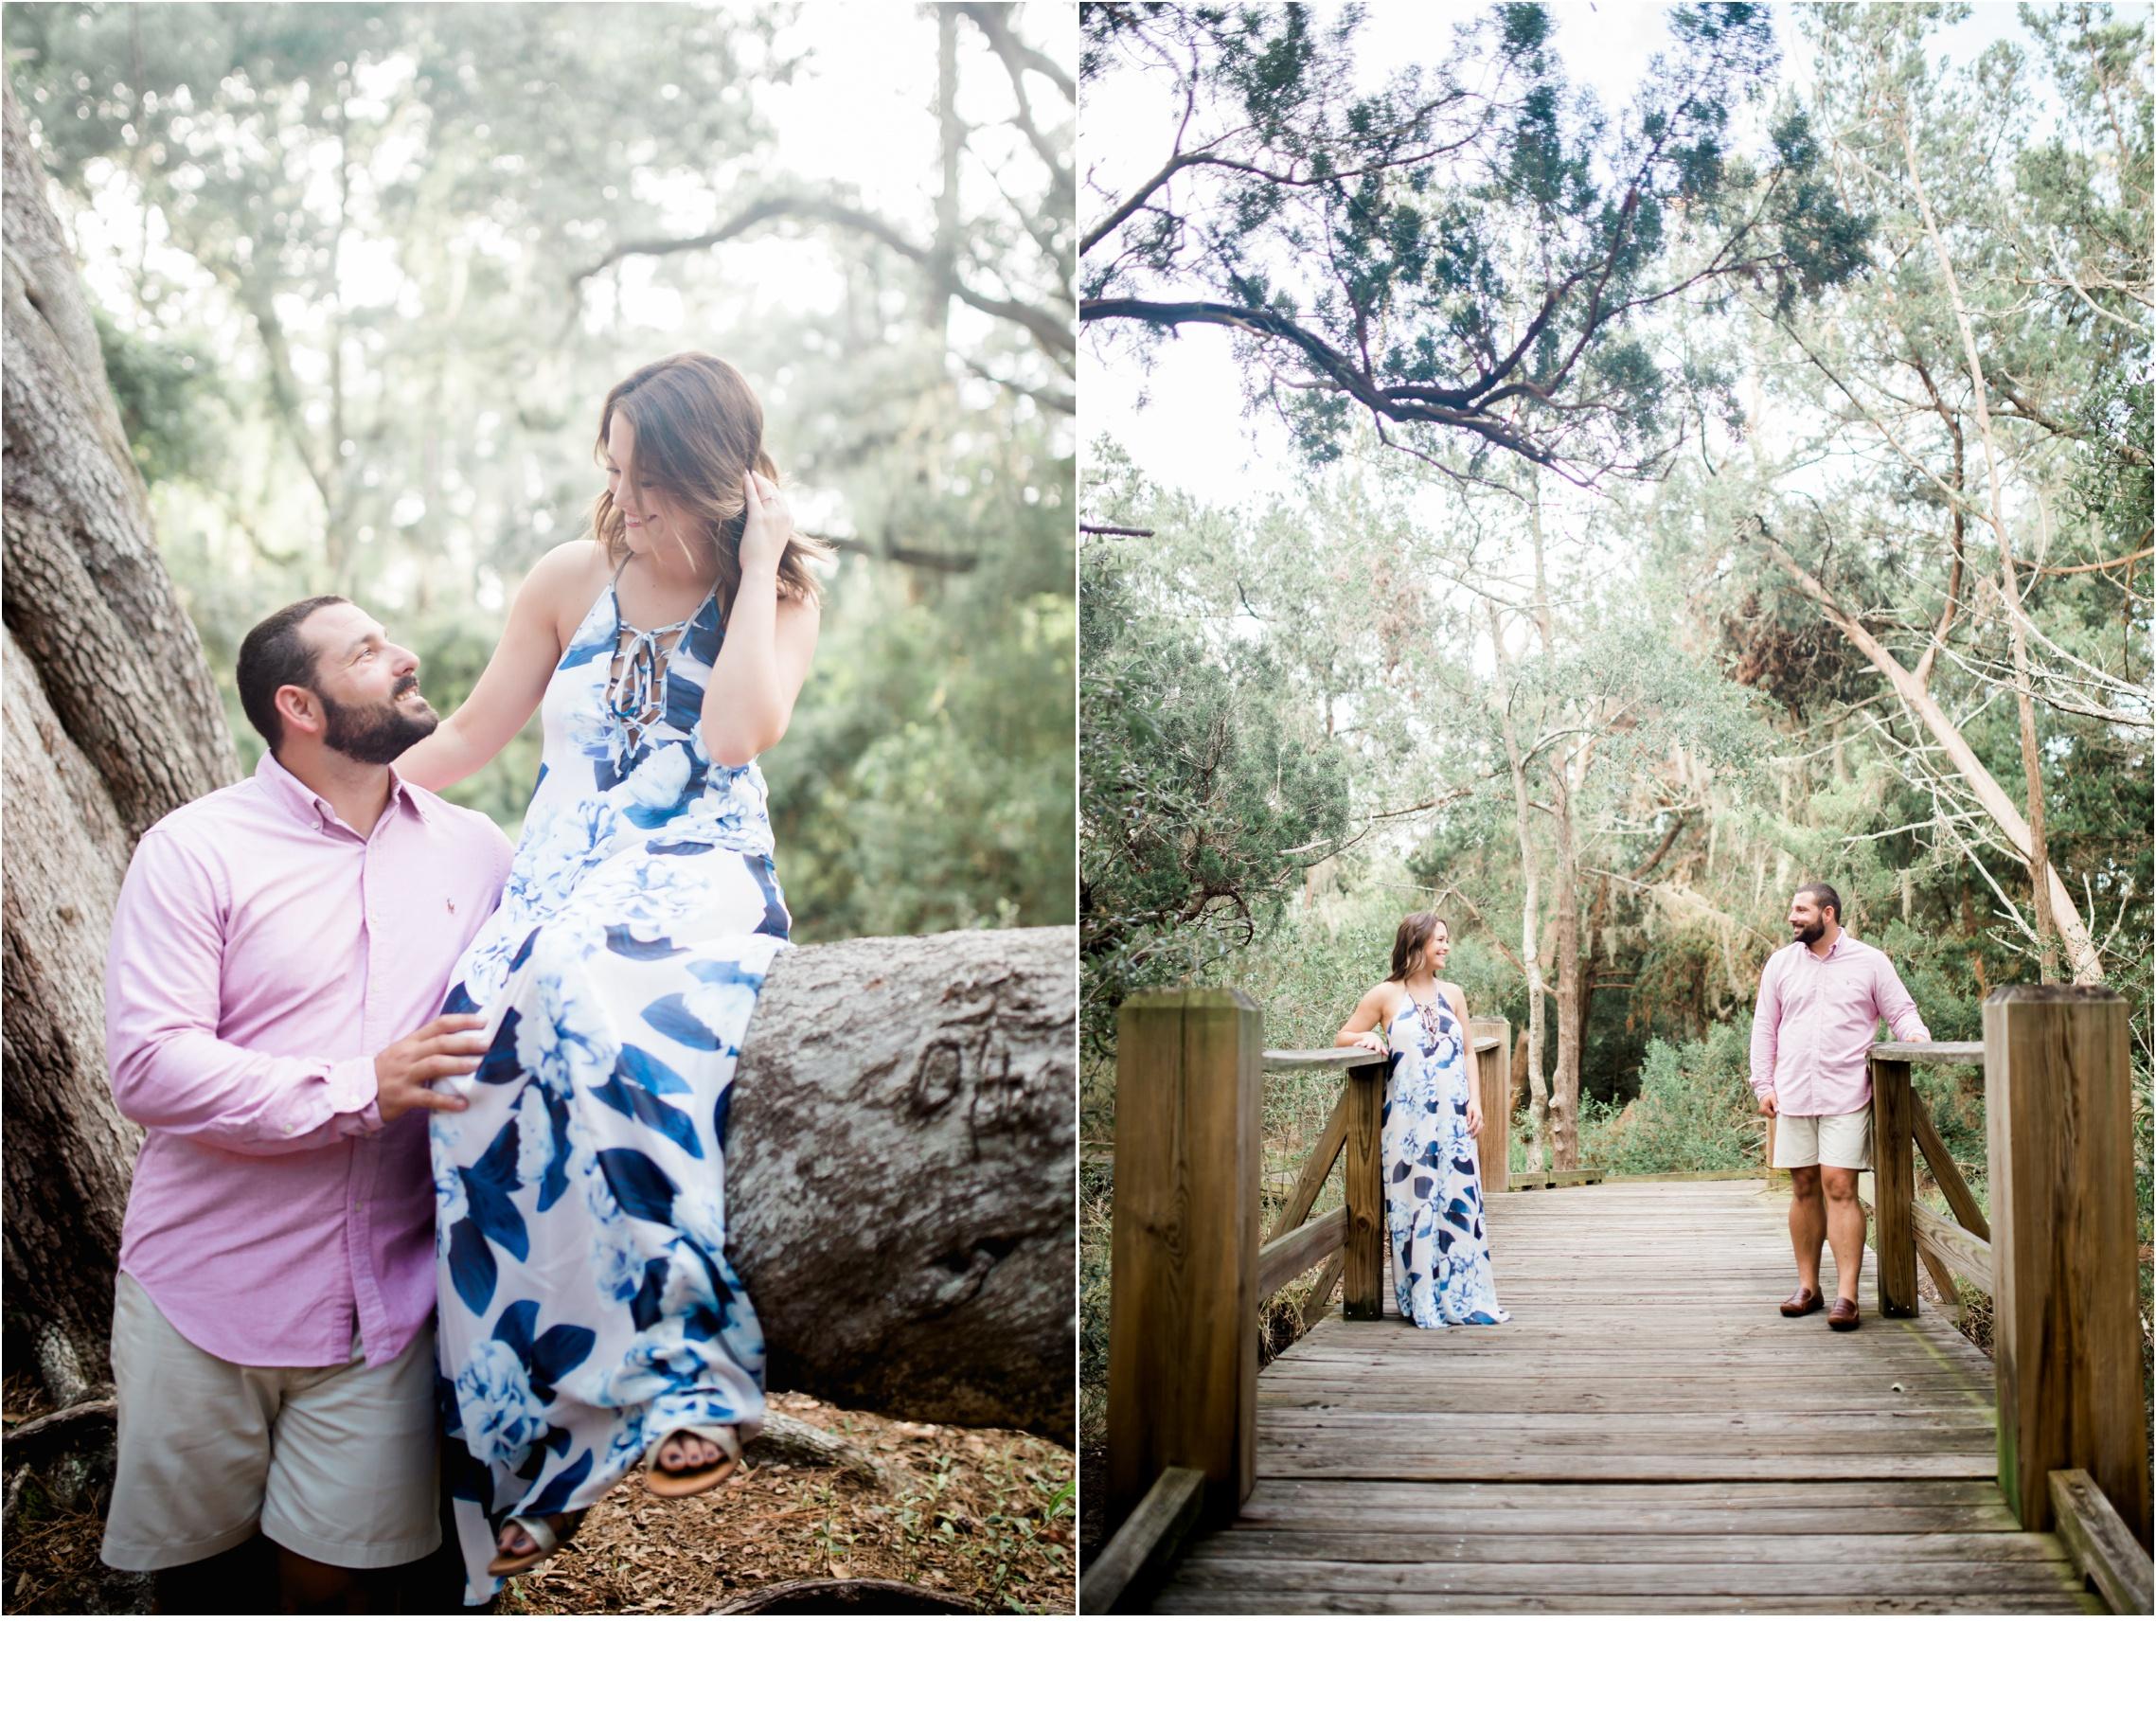 Rainey_Gregg_Photography_St._Simons_Island_Georgia_California_Wedding_Portrait_Photography_0145.jpg